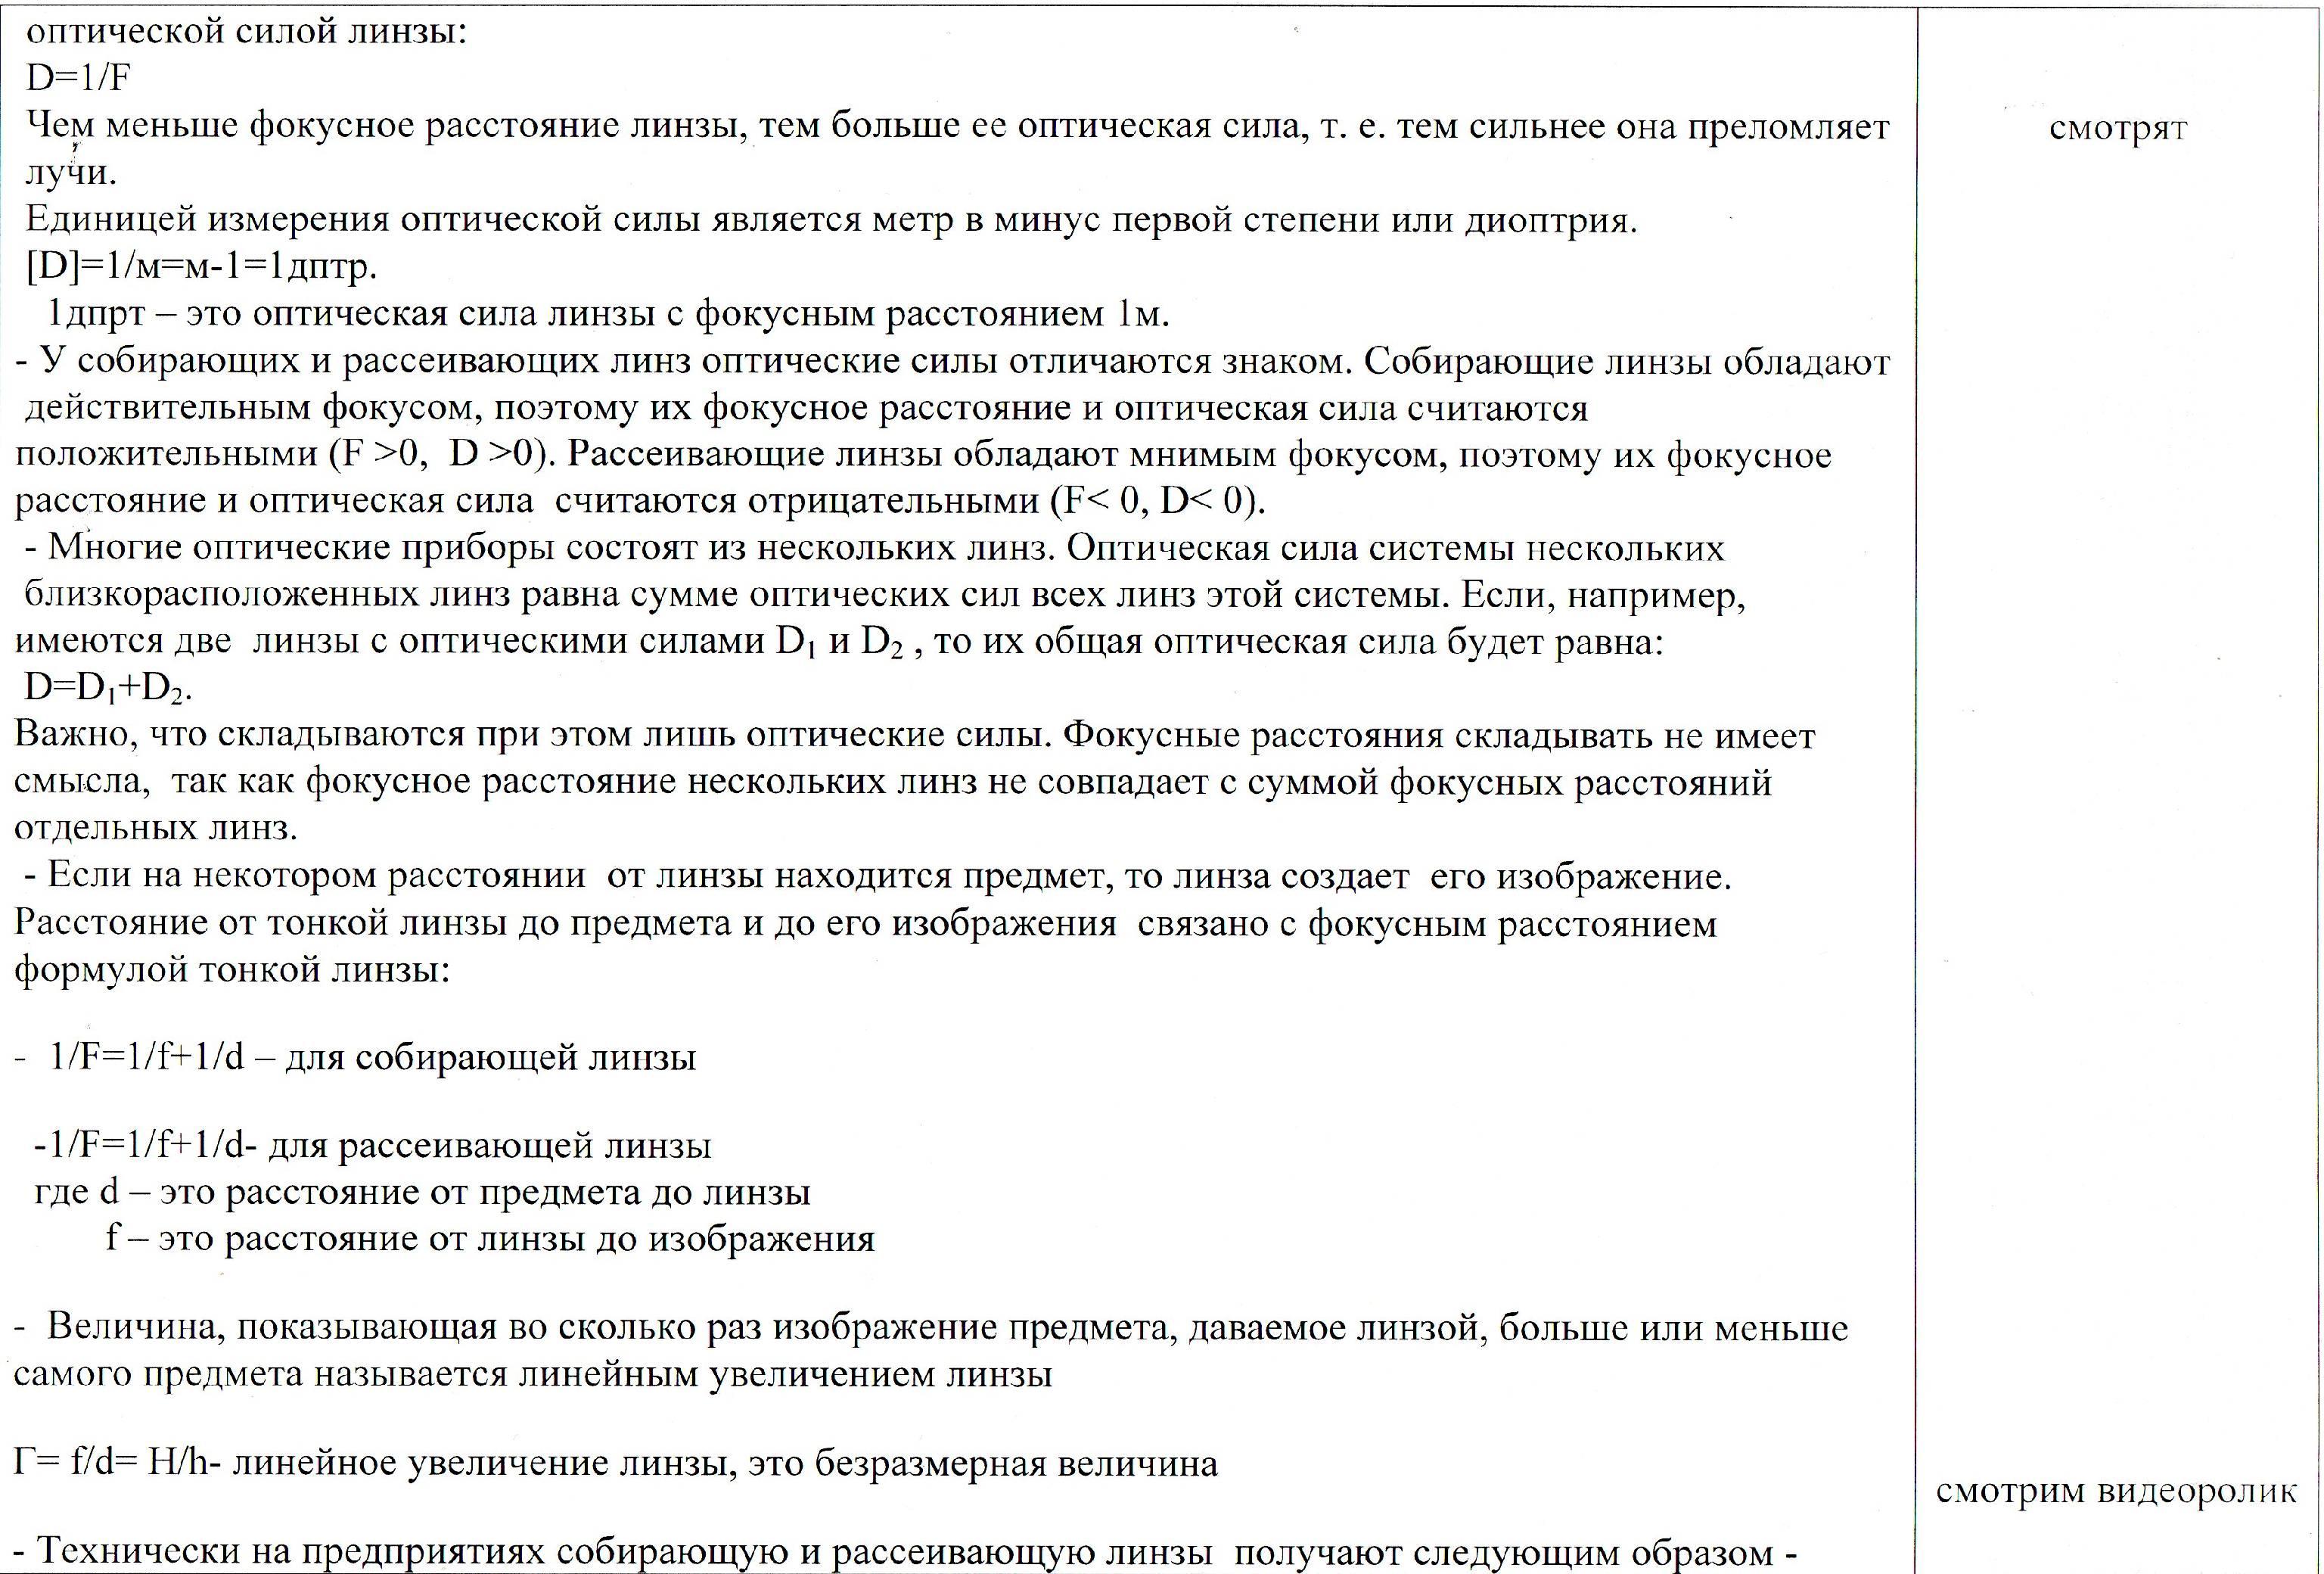 hello_html_m386e5a09.jpg